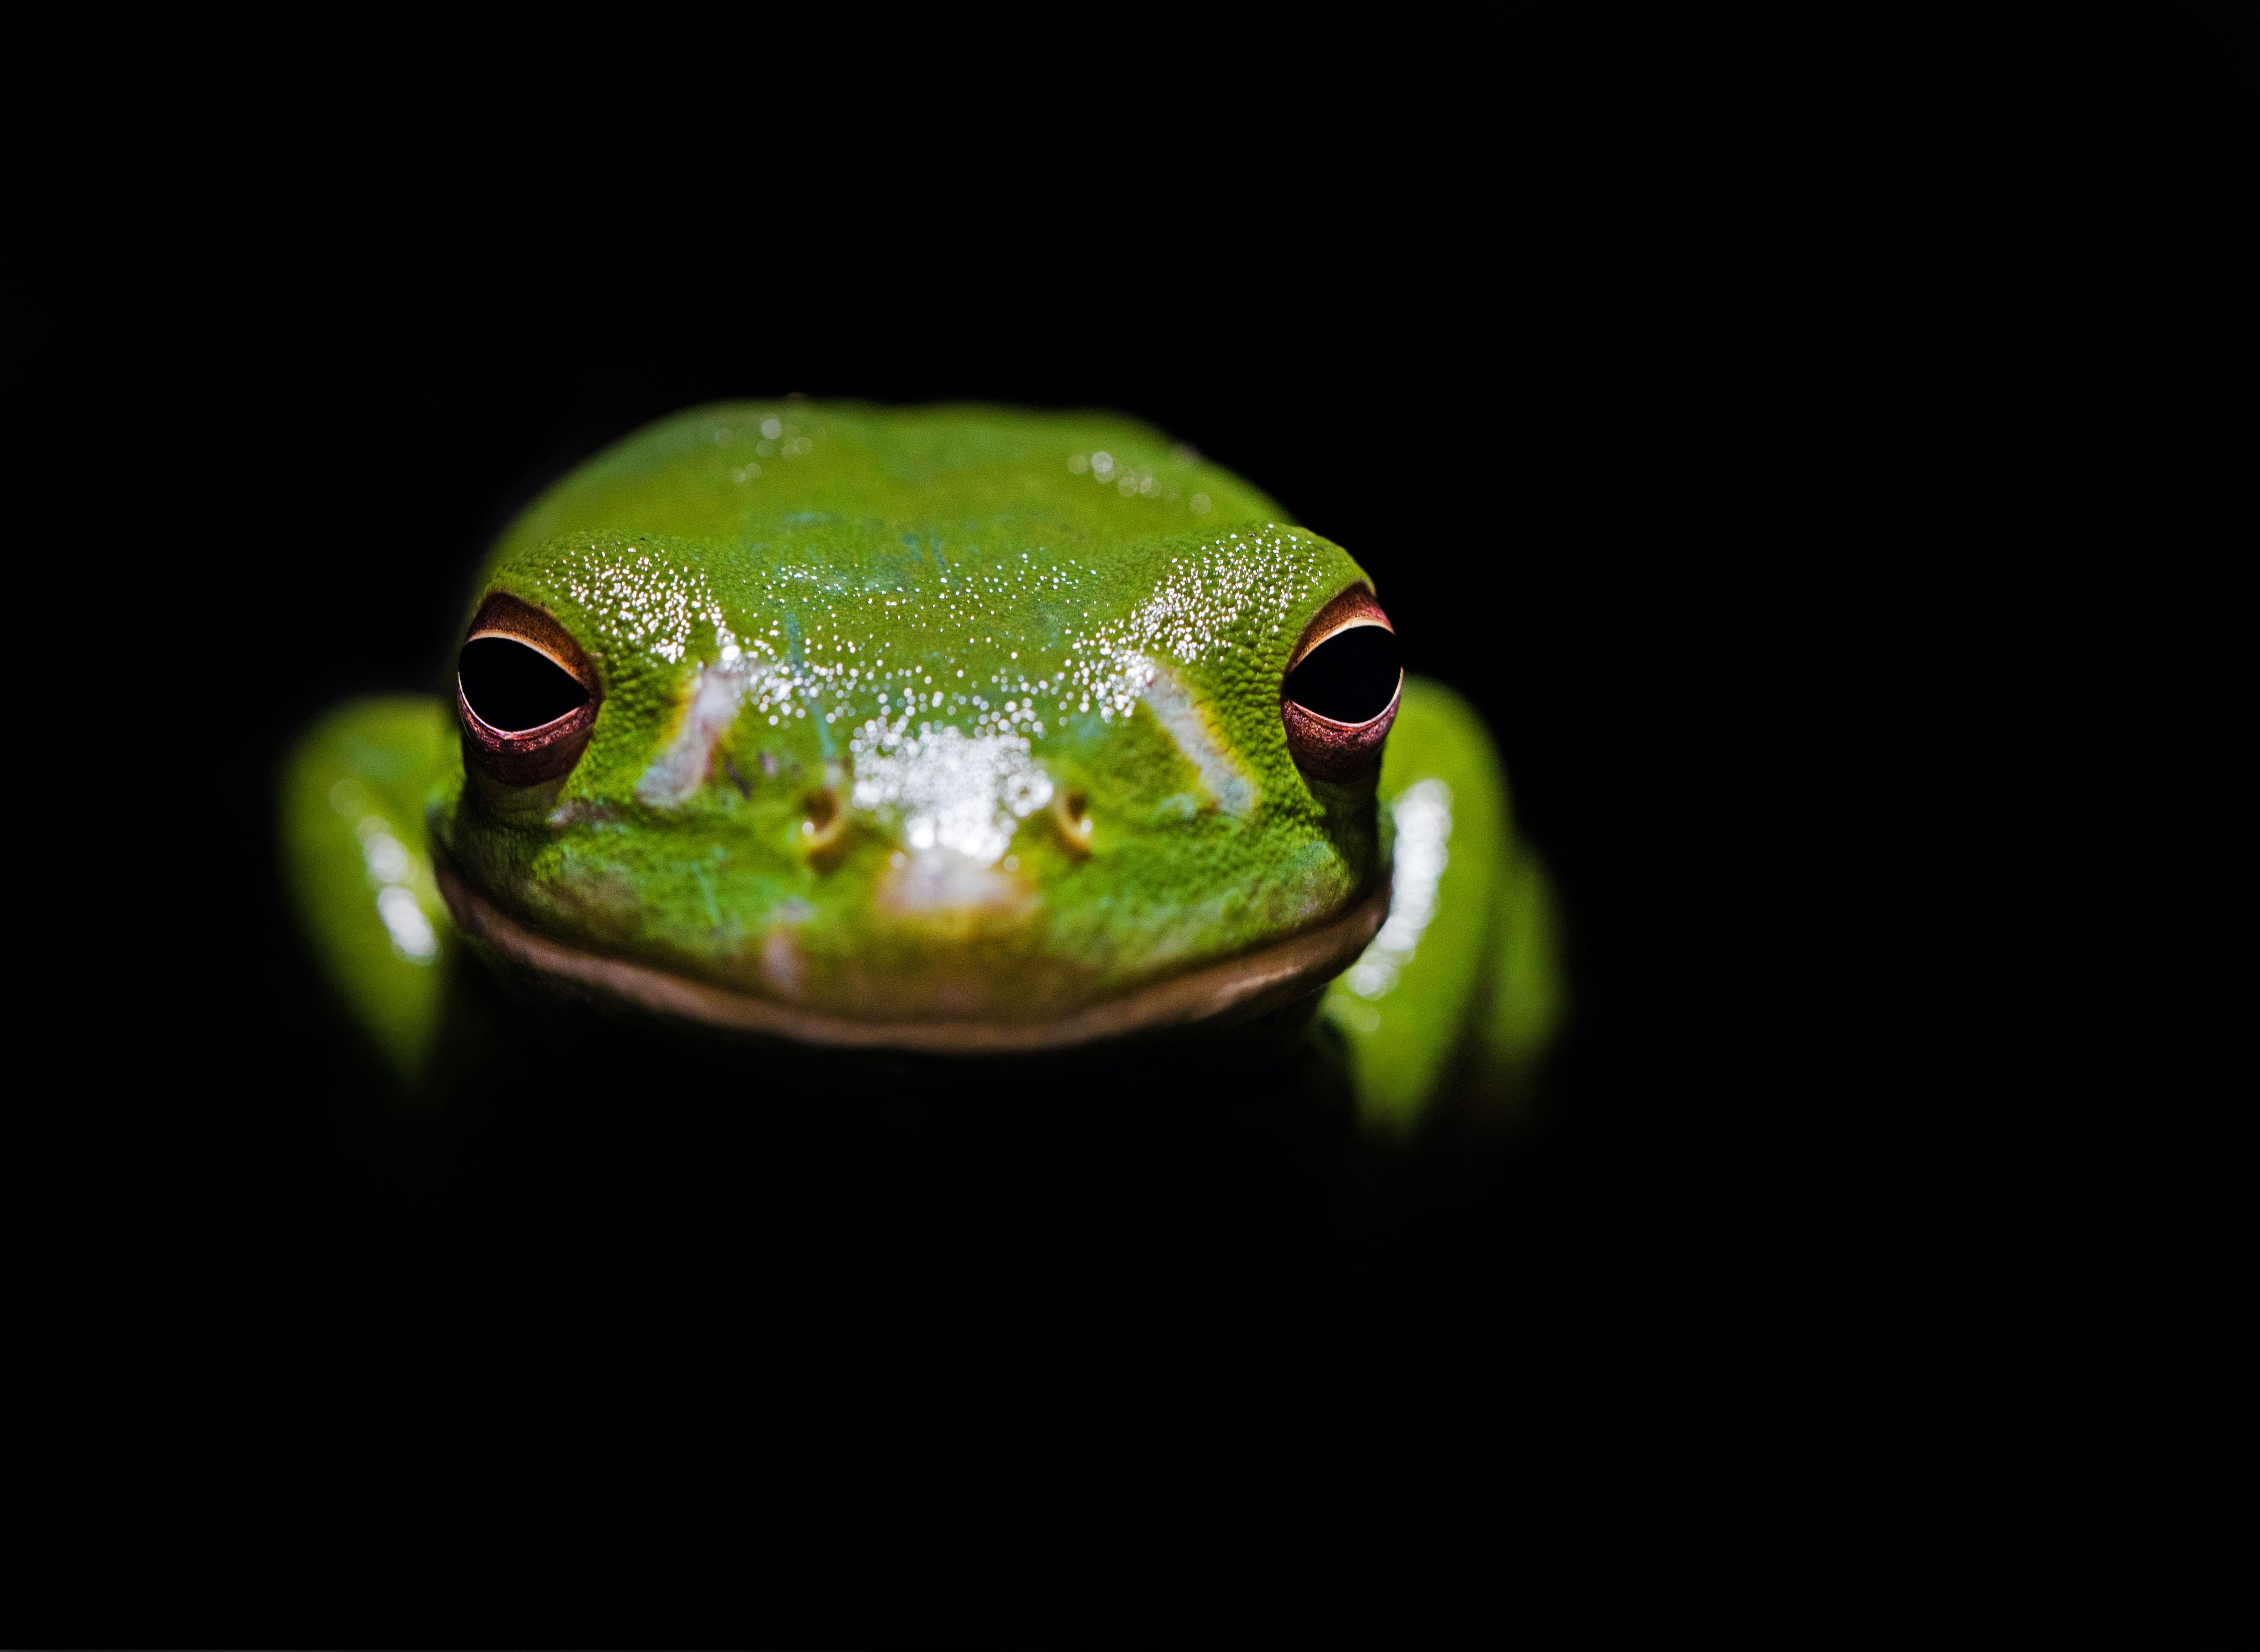 green frog in the dark